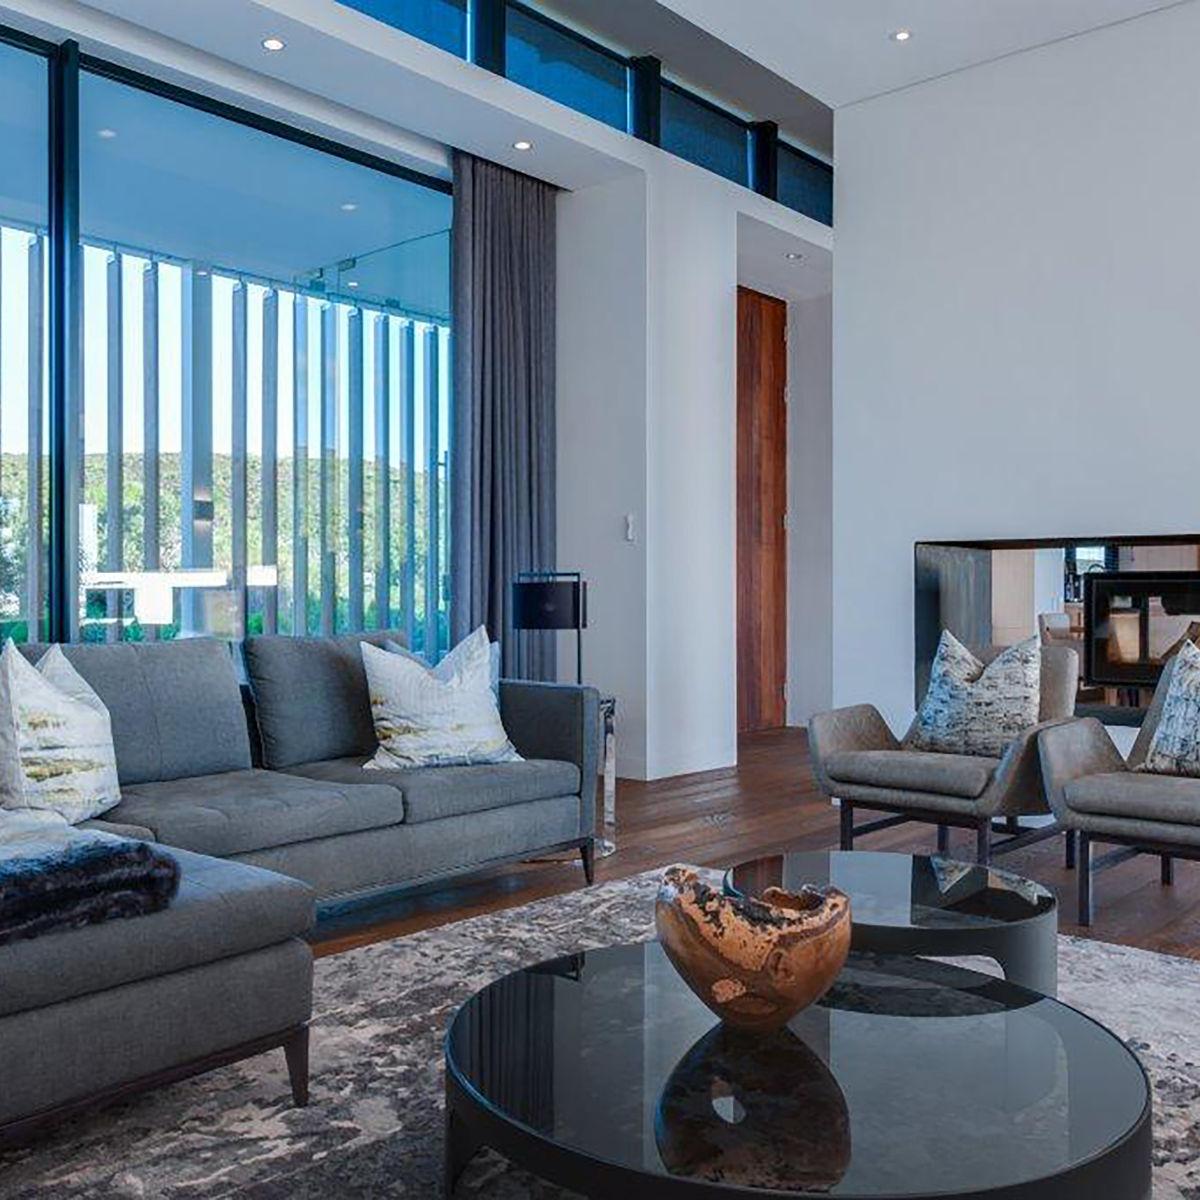 http://www.okha.com/wp-content/uploads/2017/05/grootbos-villa-2-living-room-2-1.jpg